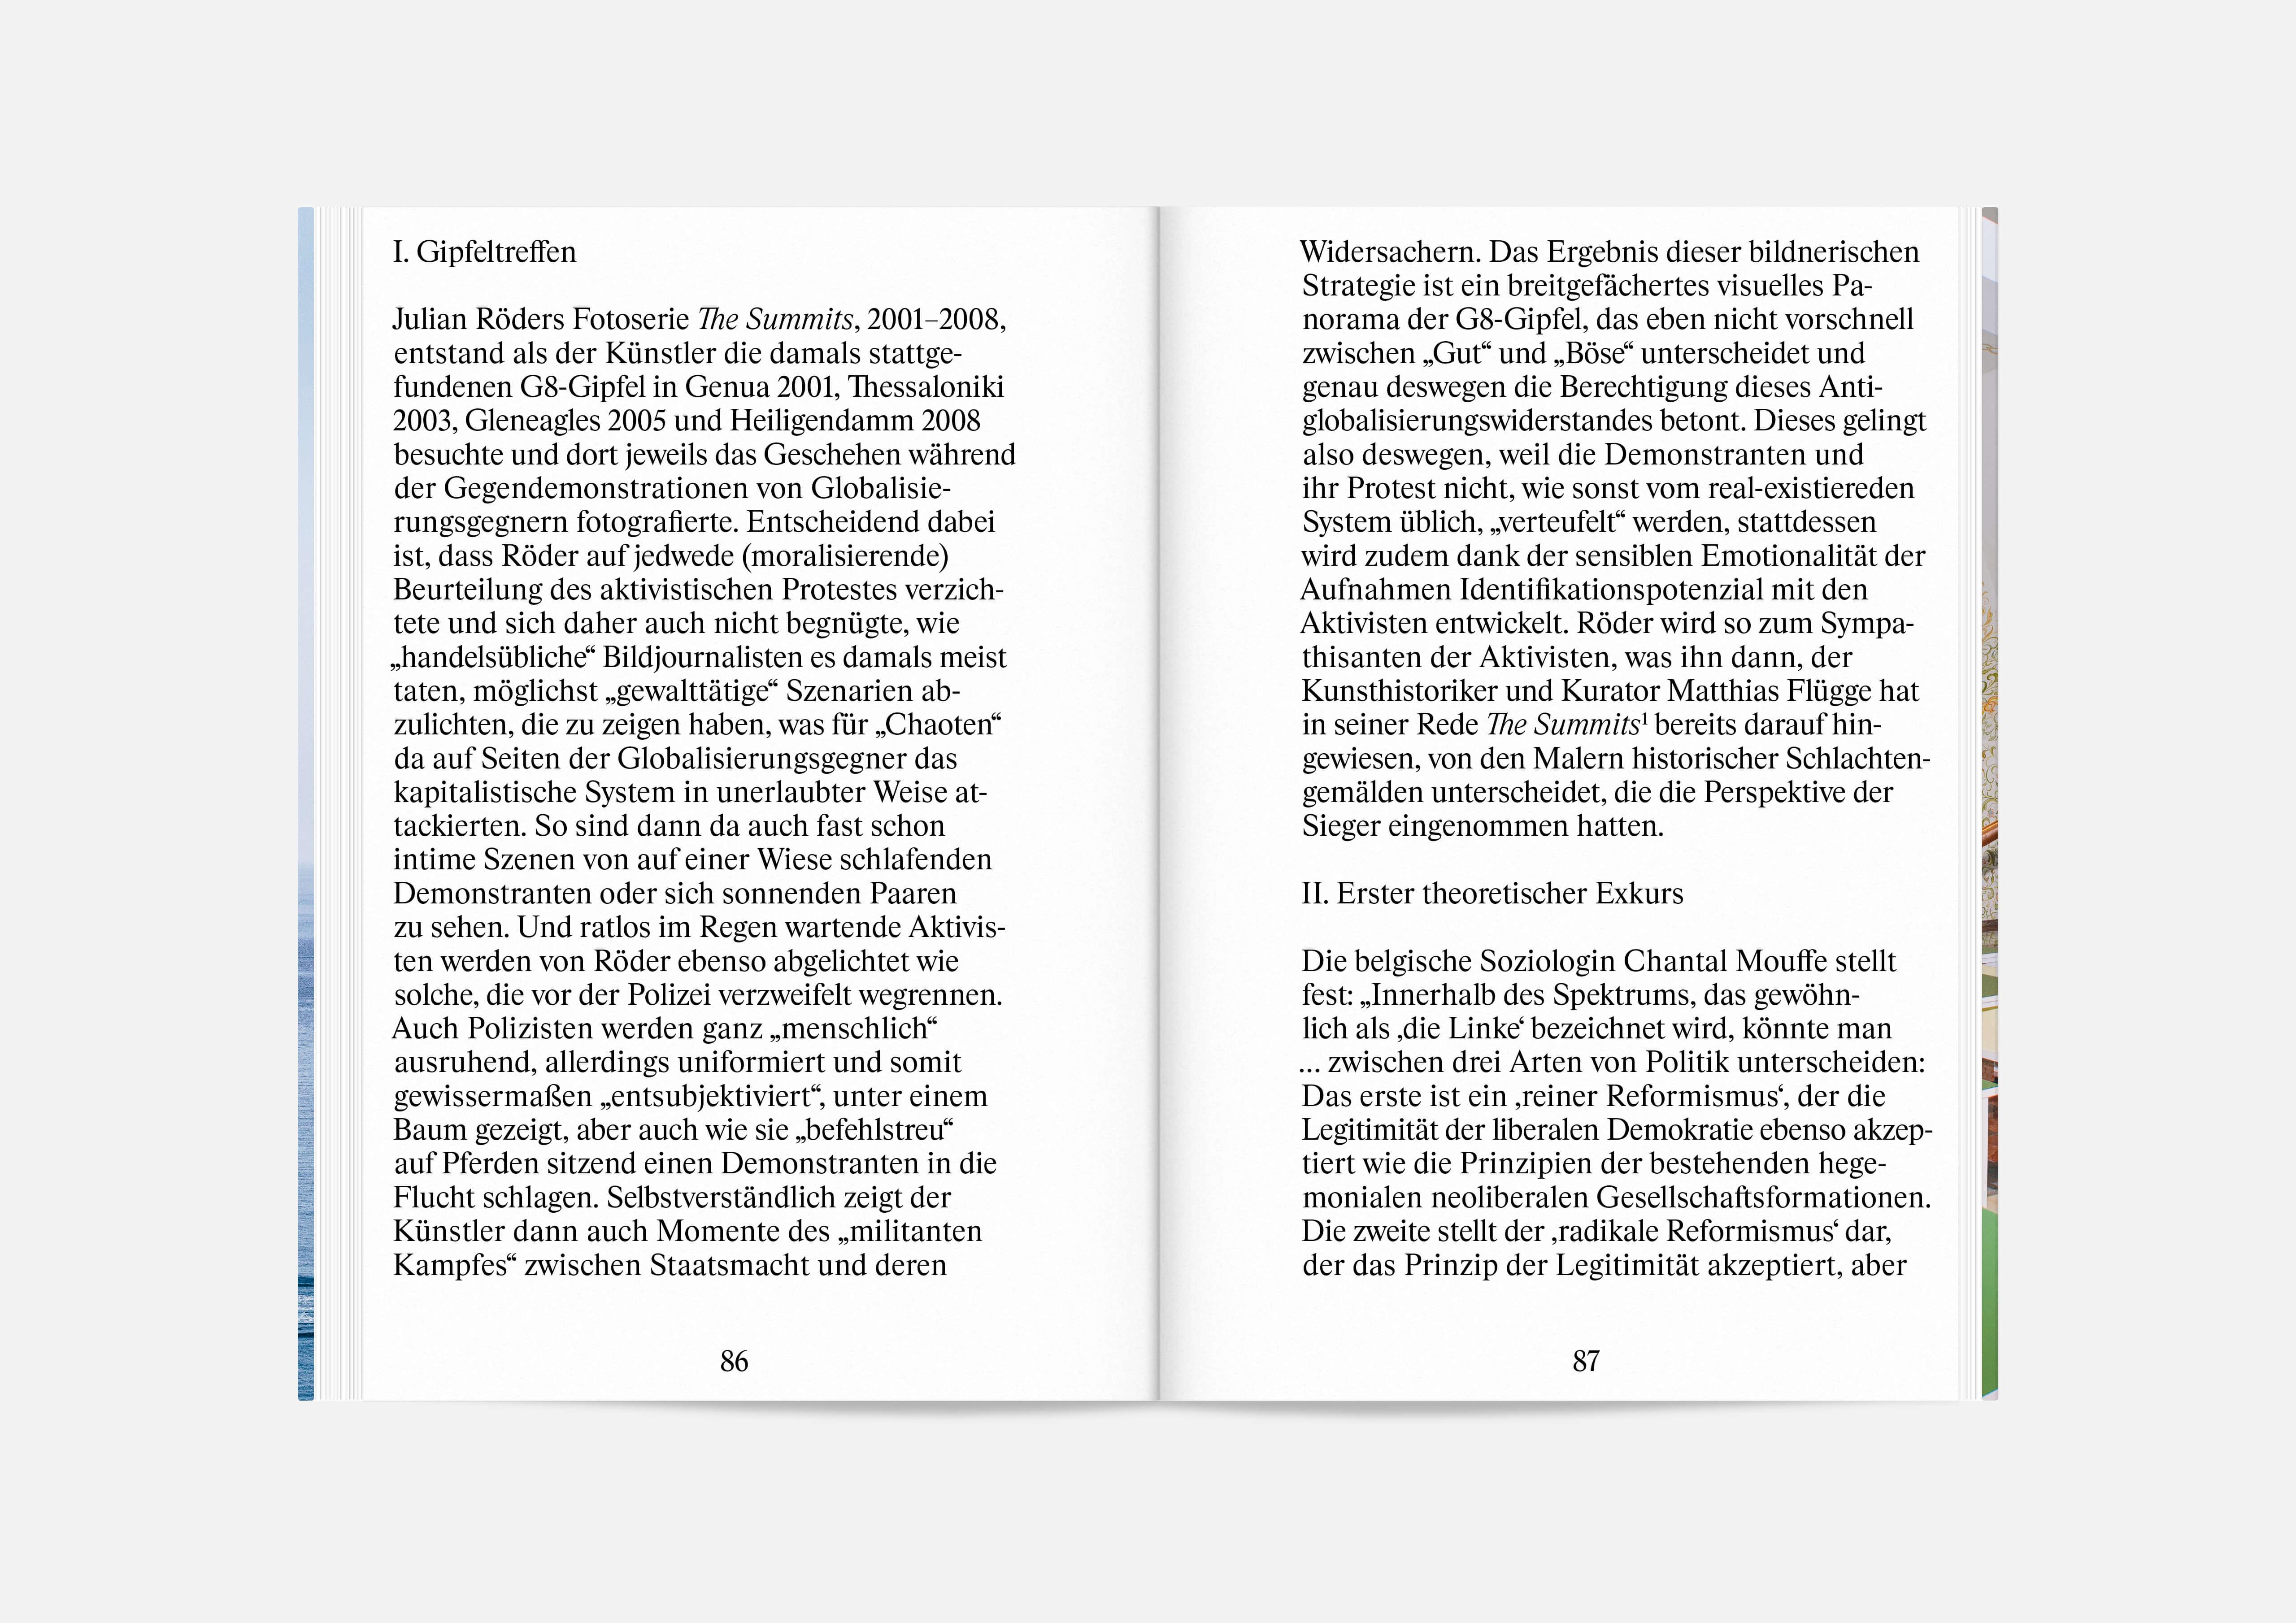 https://neuegestaltung.de/media/pages/clients/julian-roeder/f464c0116e-1610896617/jr-glauben_18.jpg